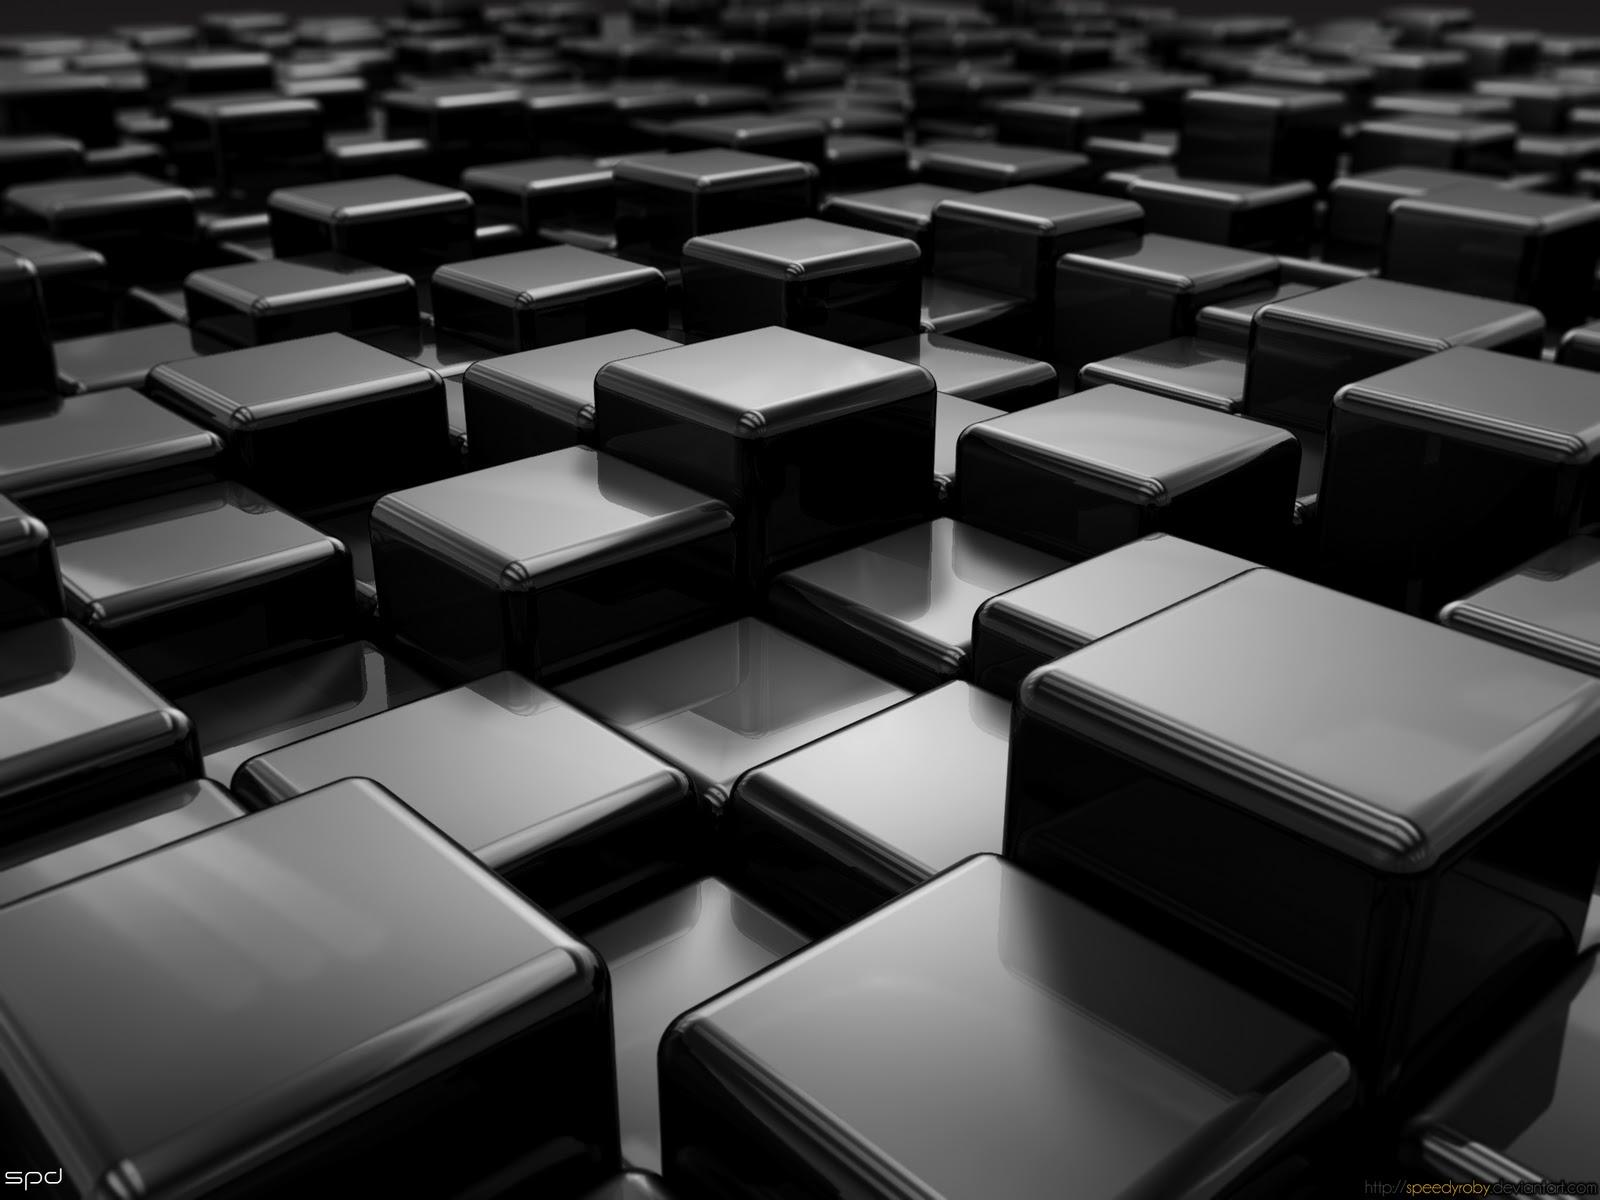 black cube wallpaper 1600x1200